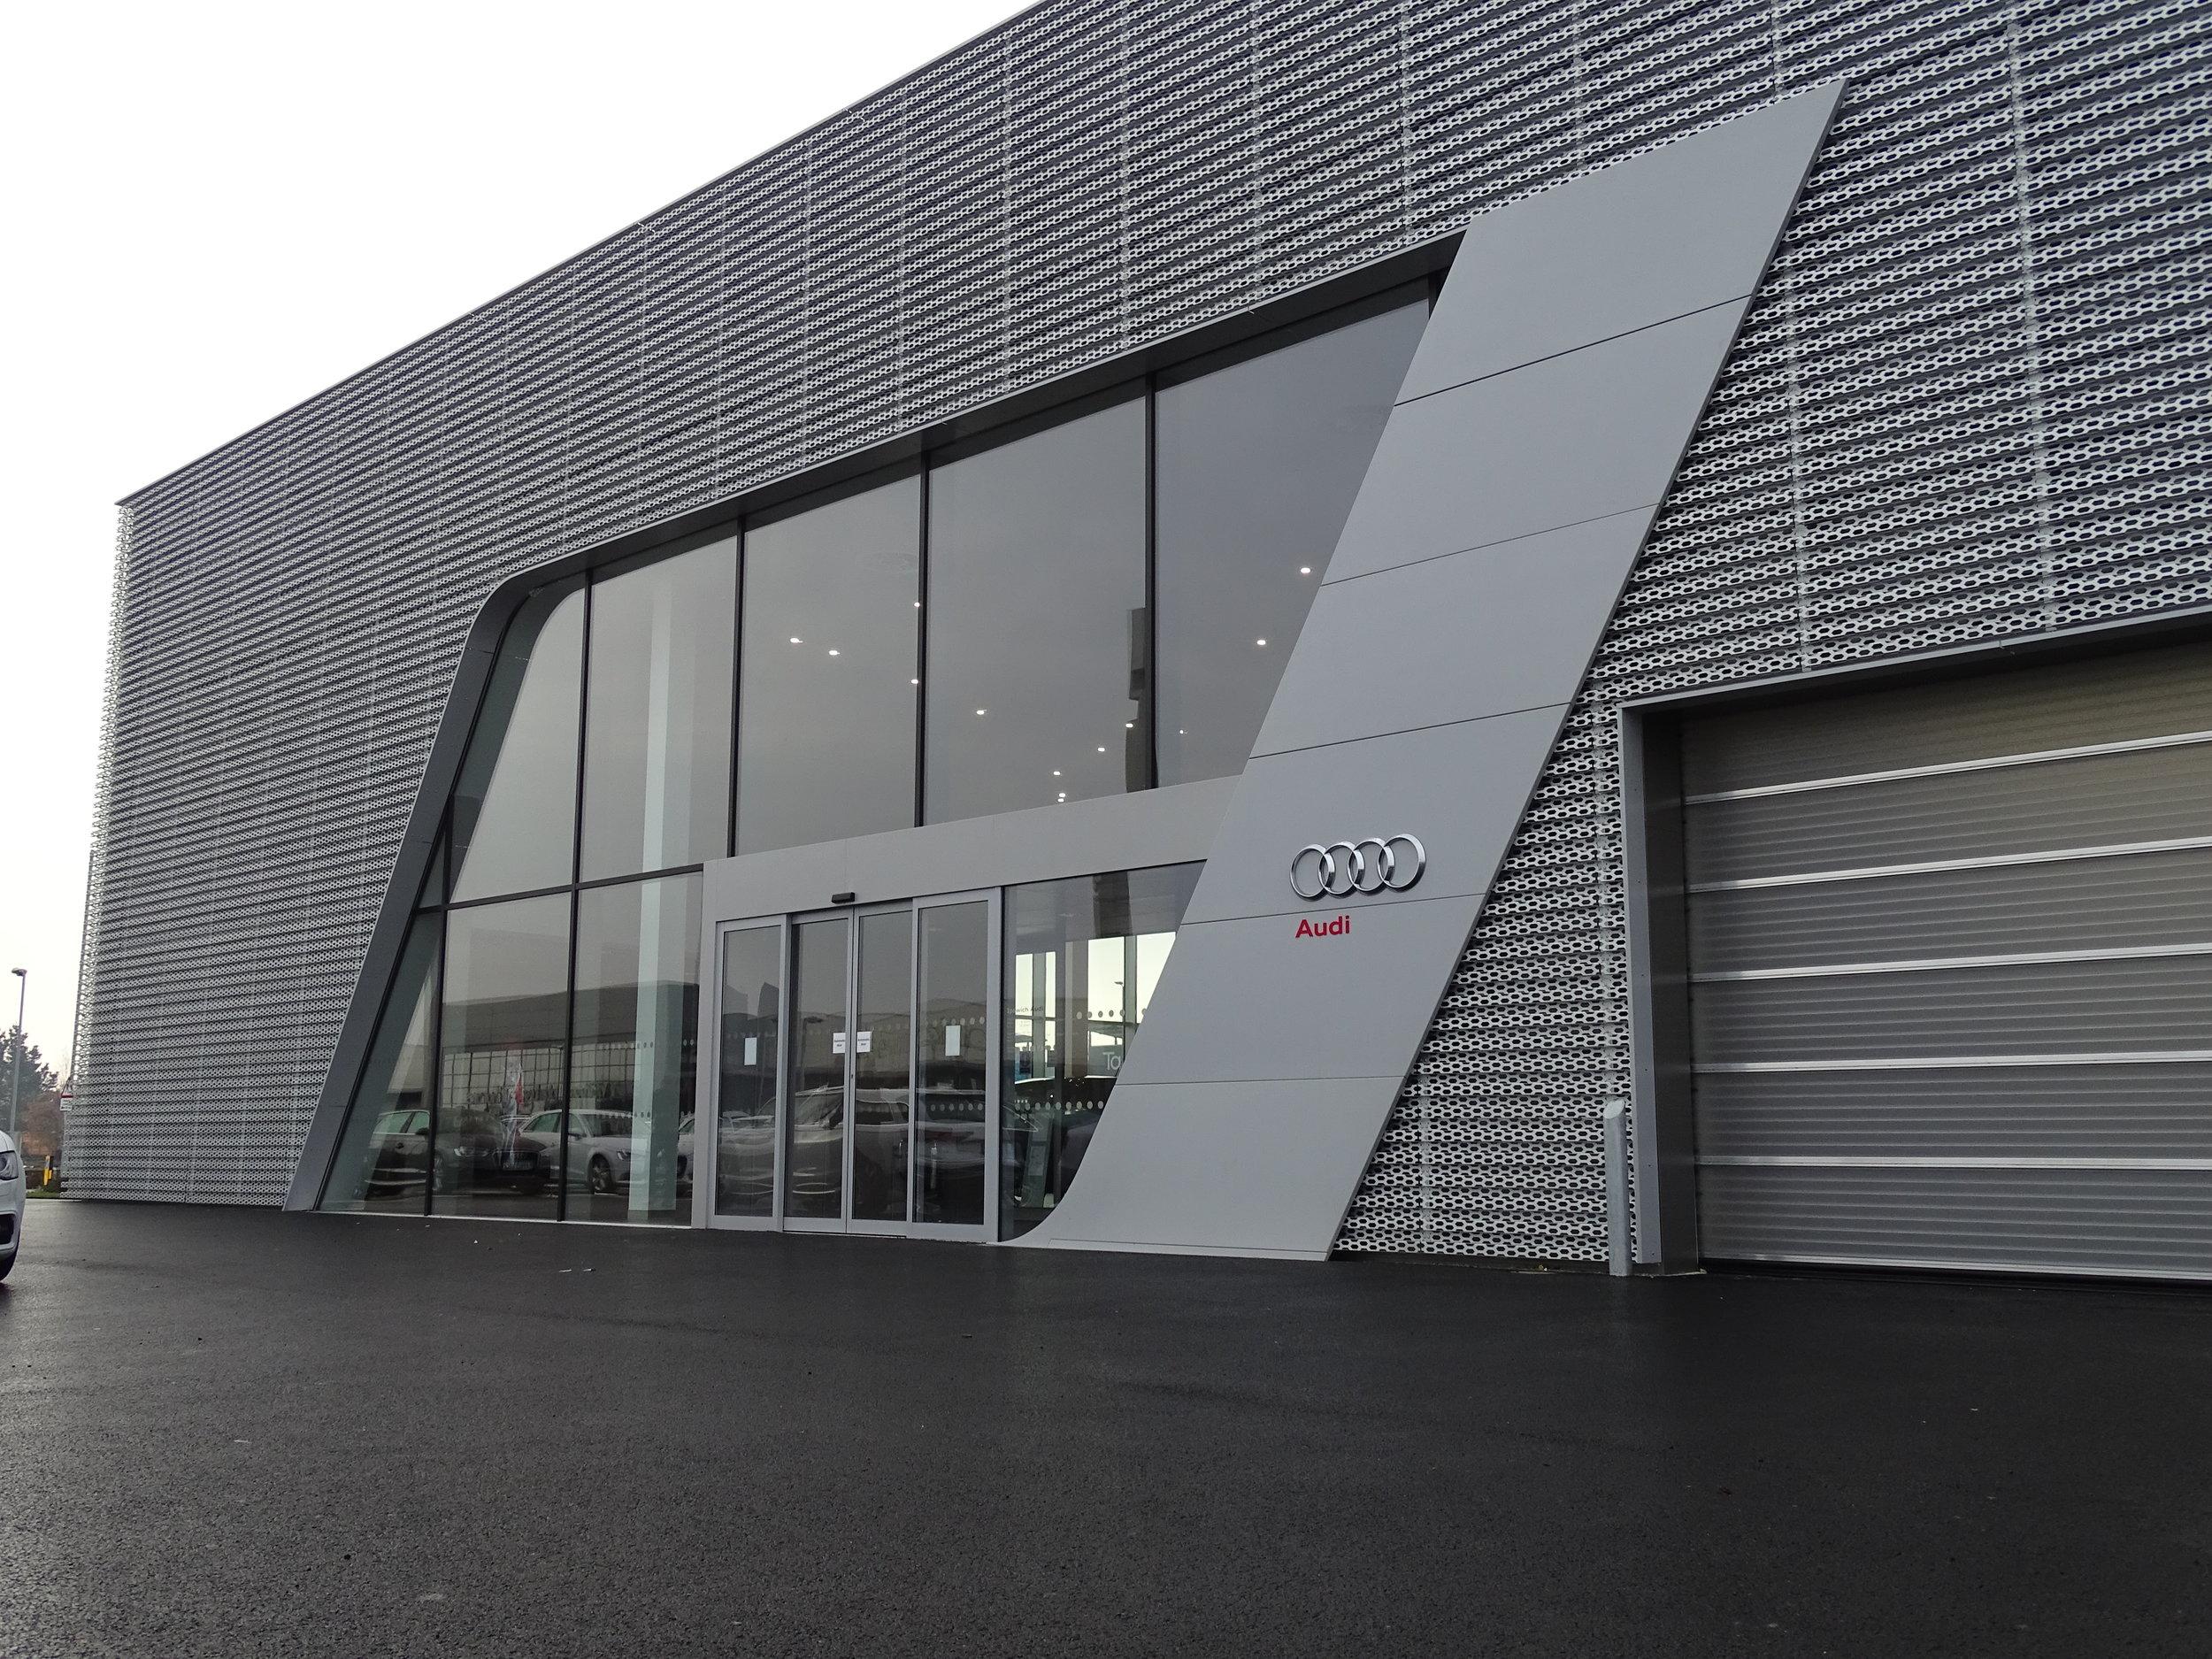 EDM Spanwall anodised aluminium perforated rainscreen cladding and PPC Aluminium curved bespoke flashings